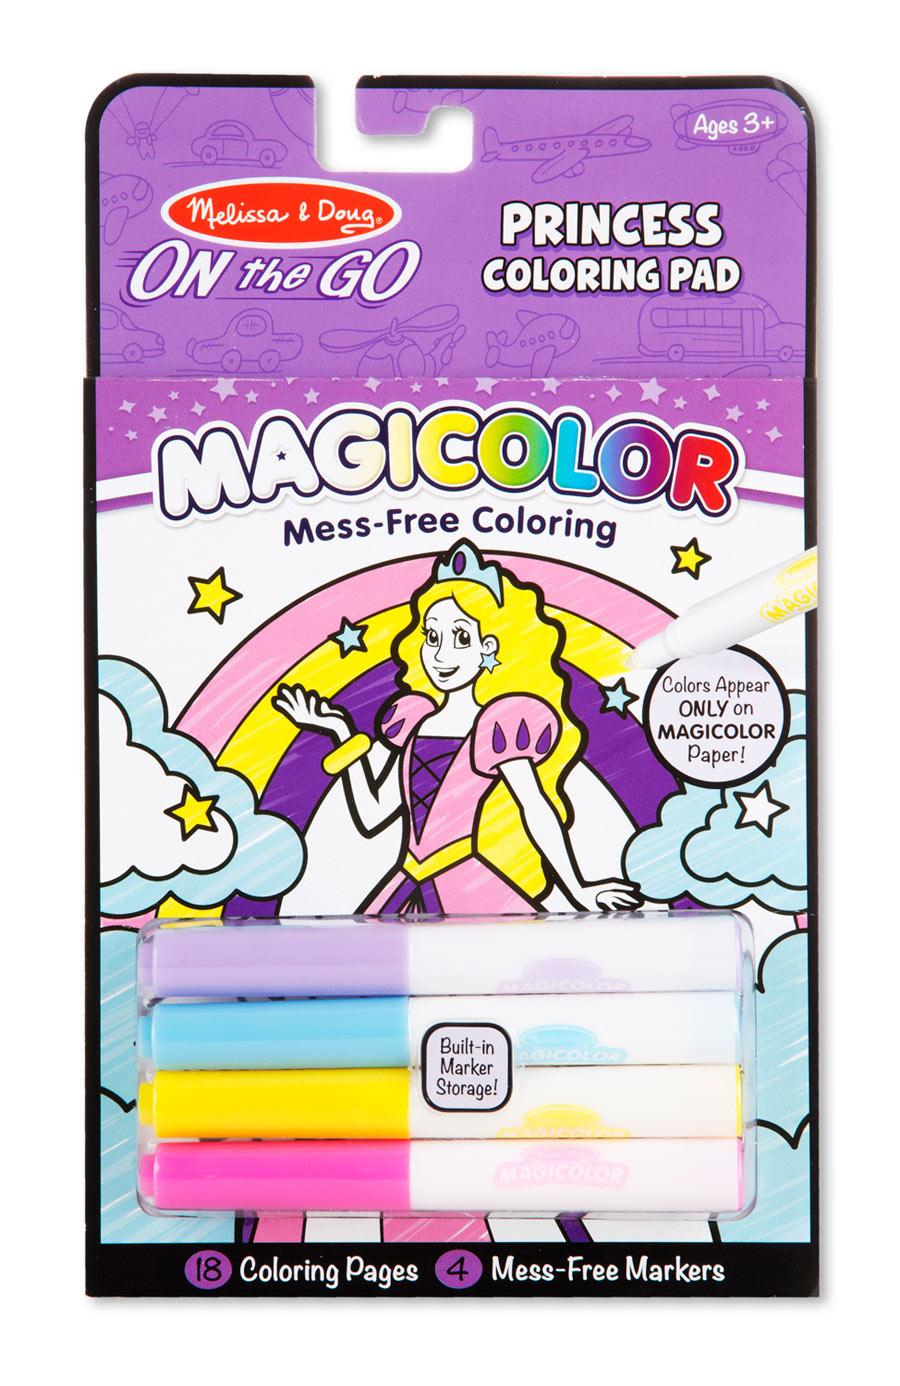 Magicolor Coloring Pad - Princess